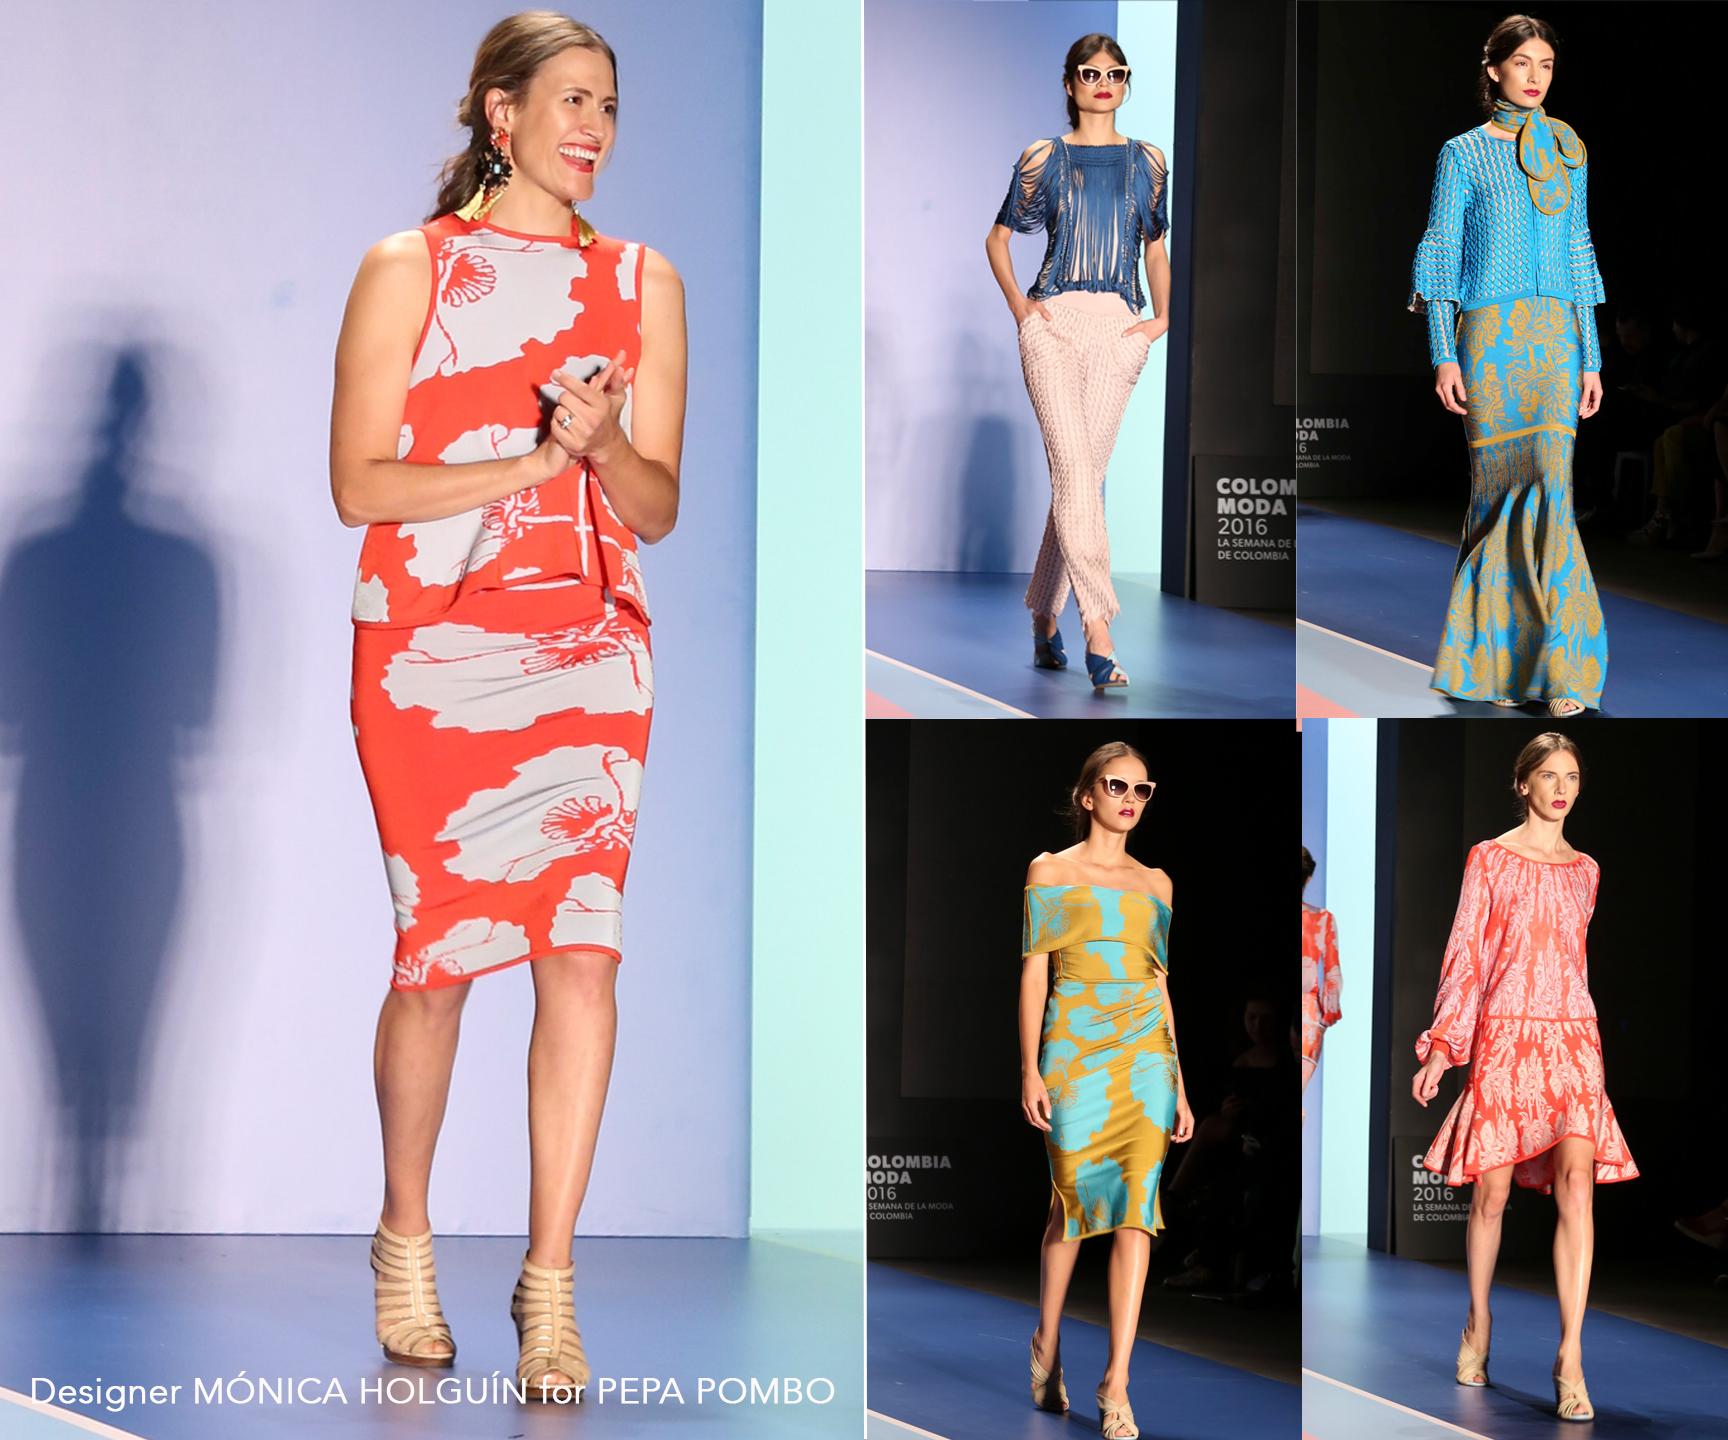 Colombia Designer - Monica Holguin